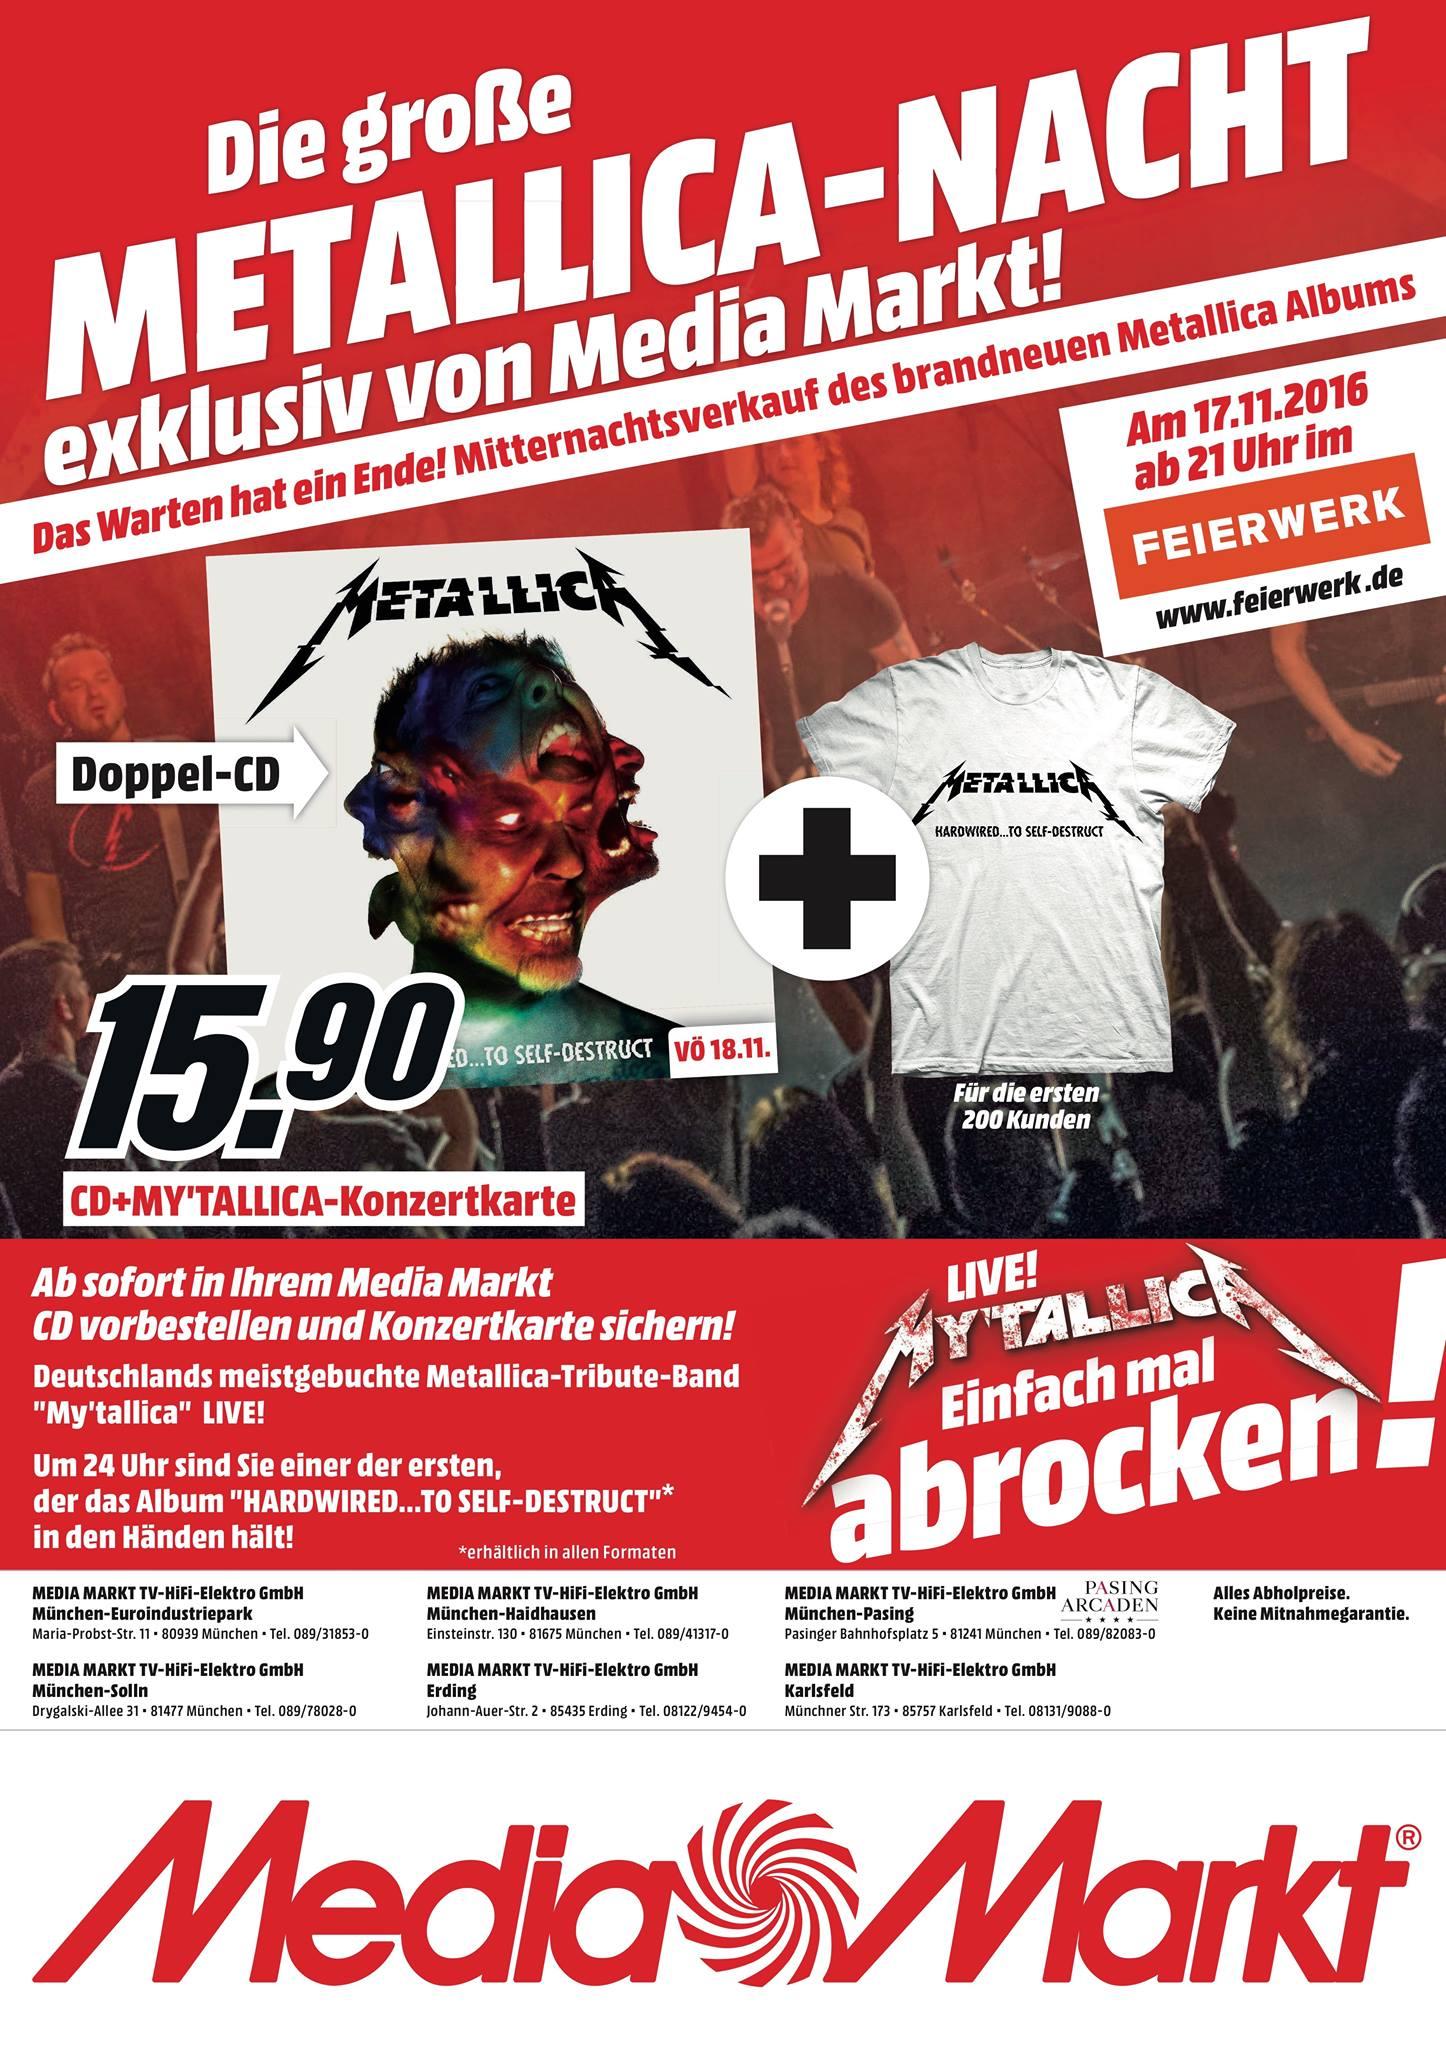 Metallica Tribute Band MY'TALLICA Album Release Show in München Feierwerk Flyer